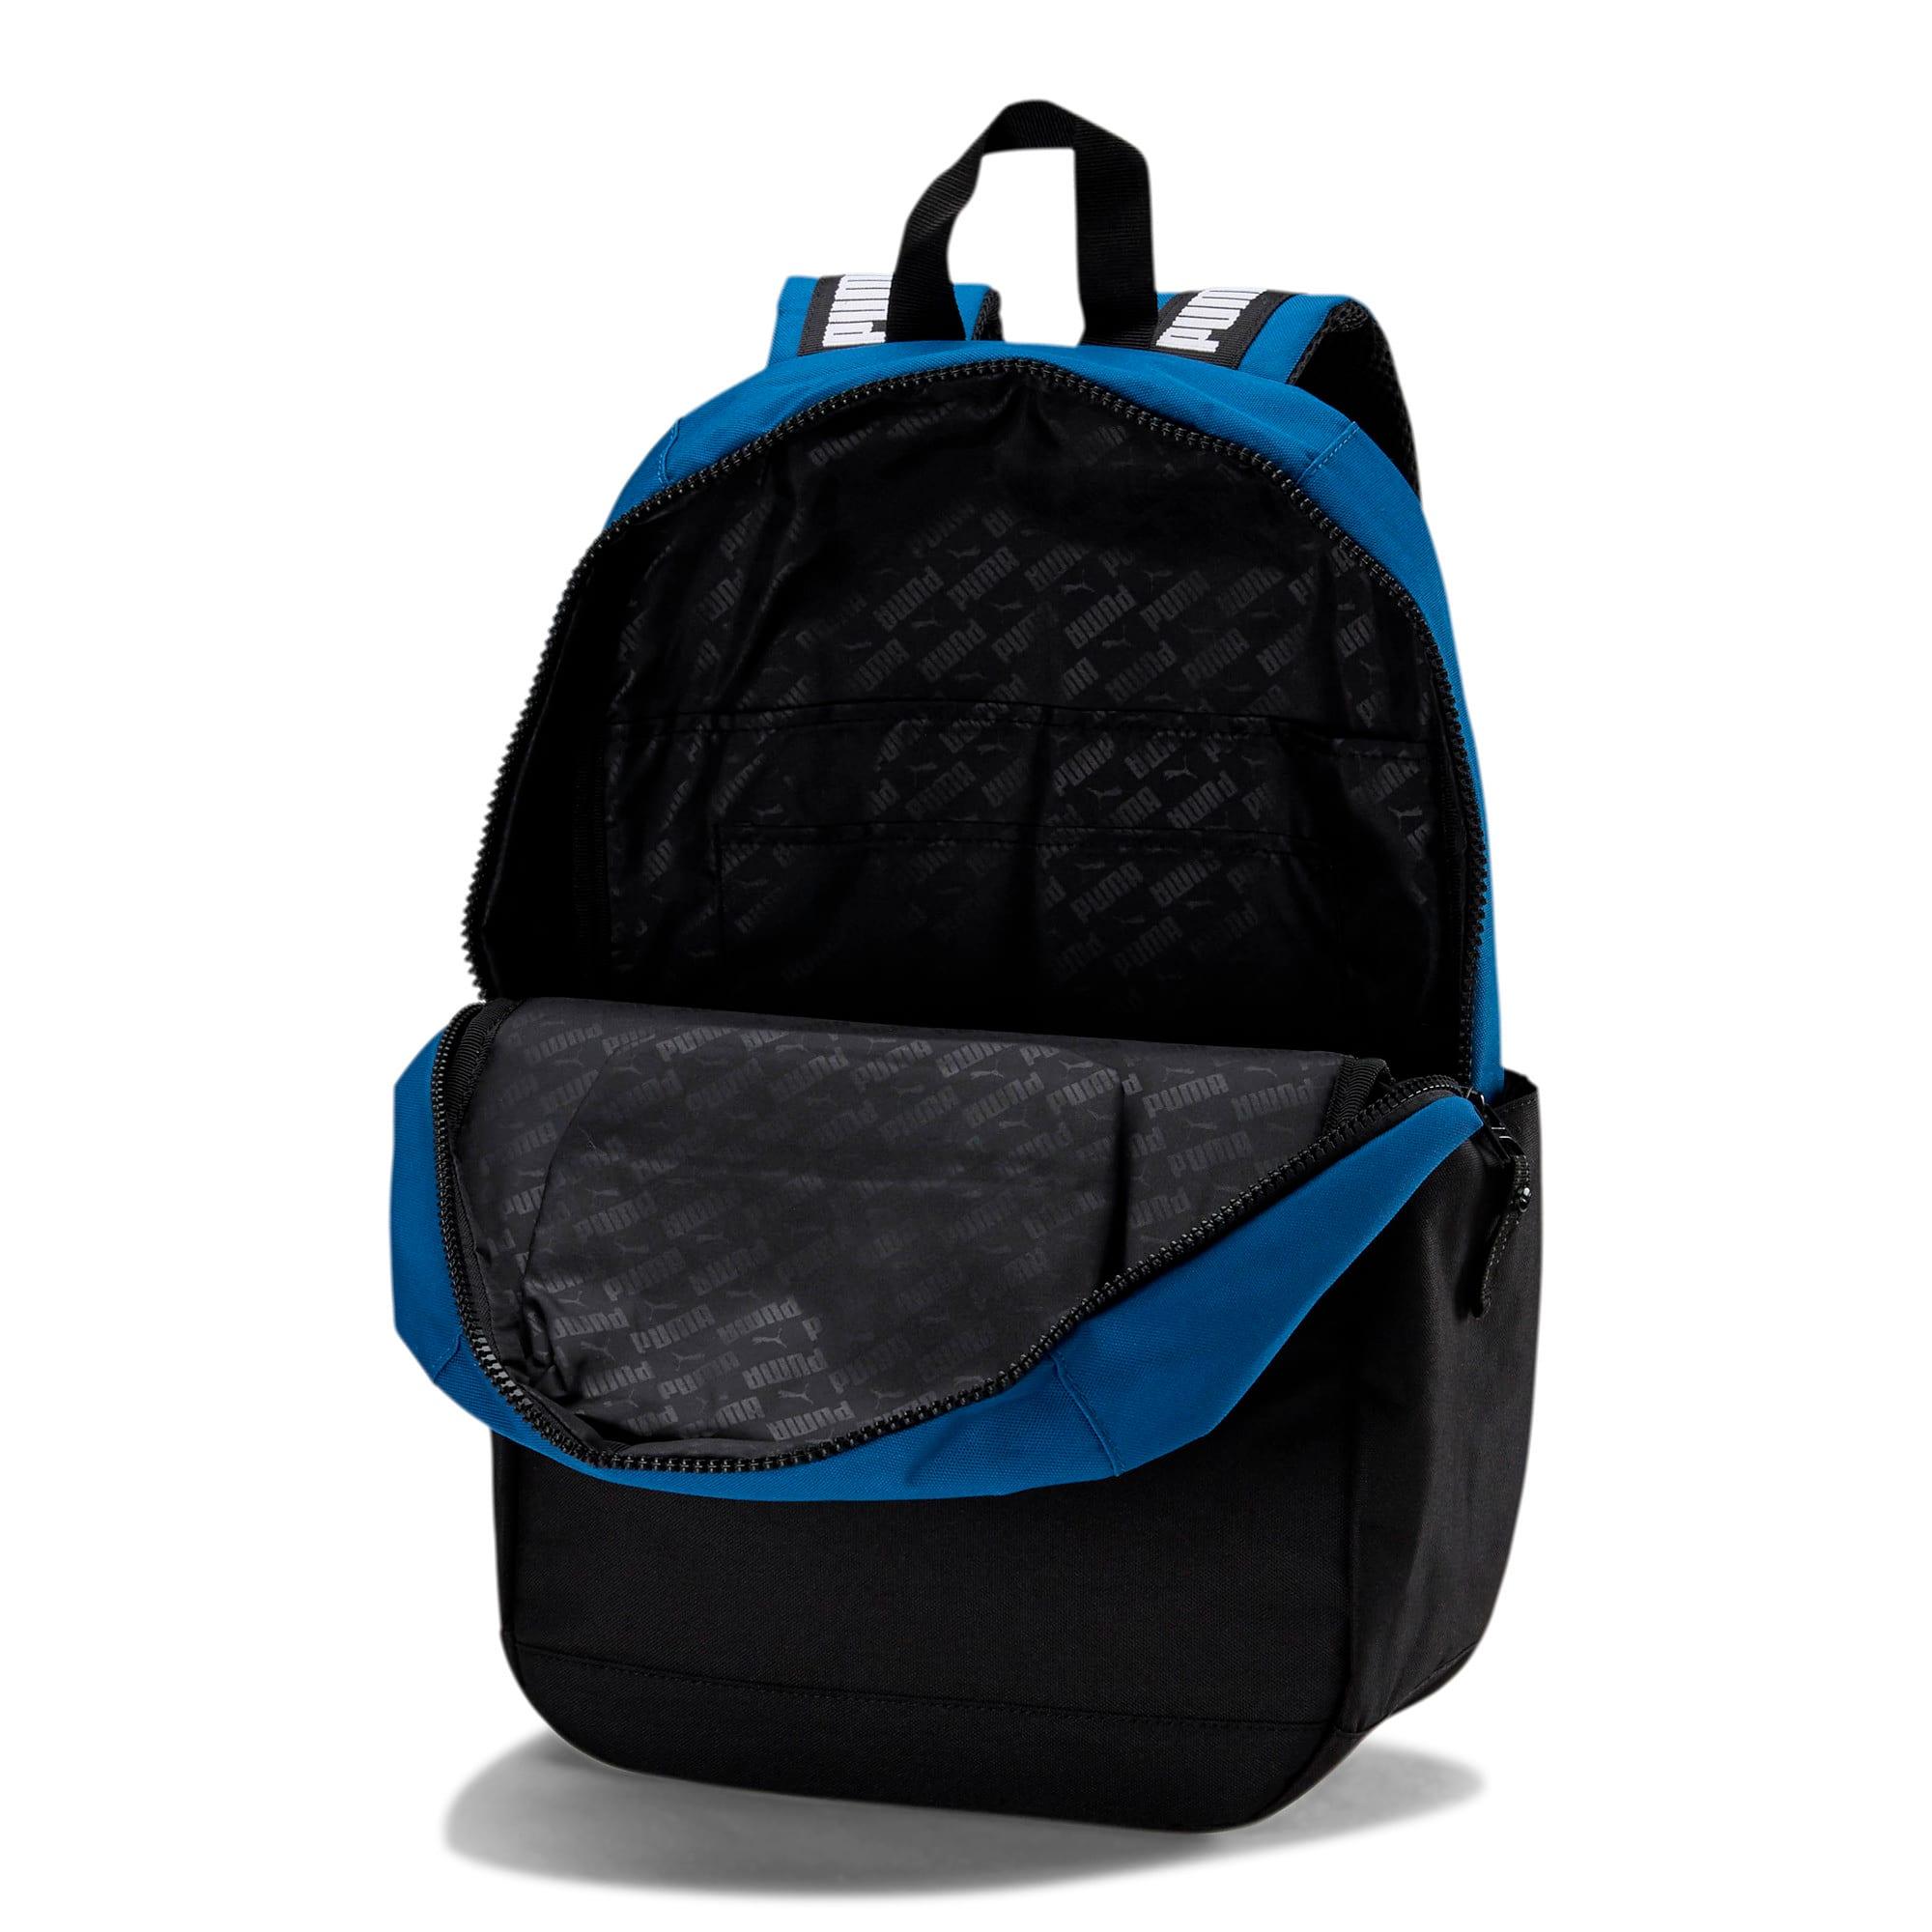 Thumbnail 3 of Streak Backpack, Blue Combo, medium